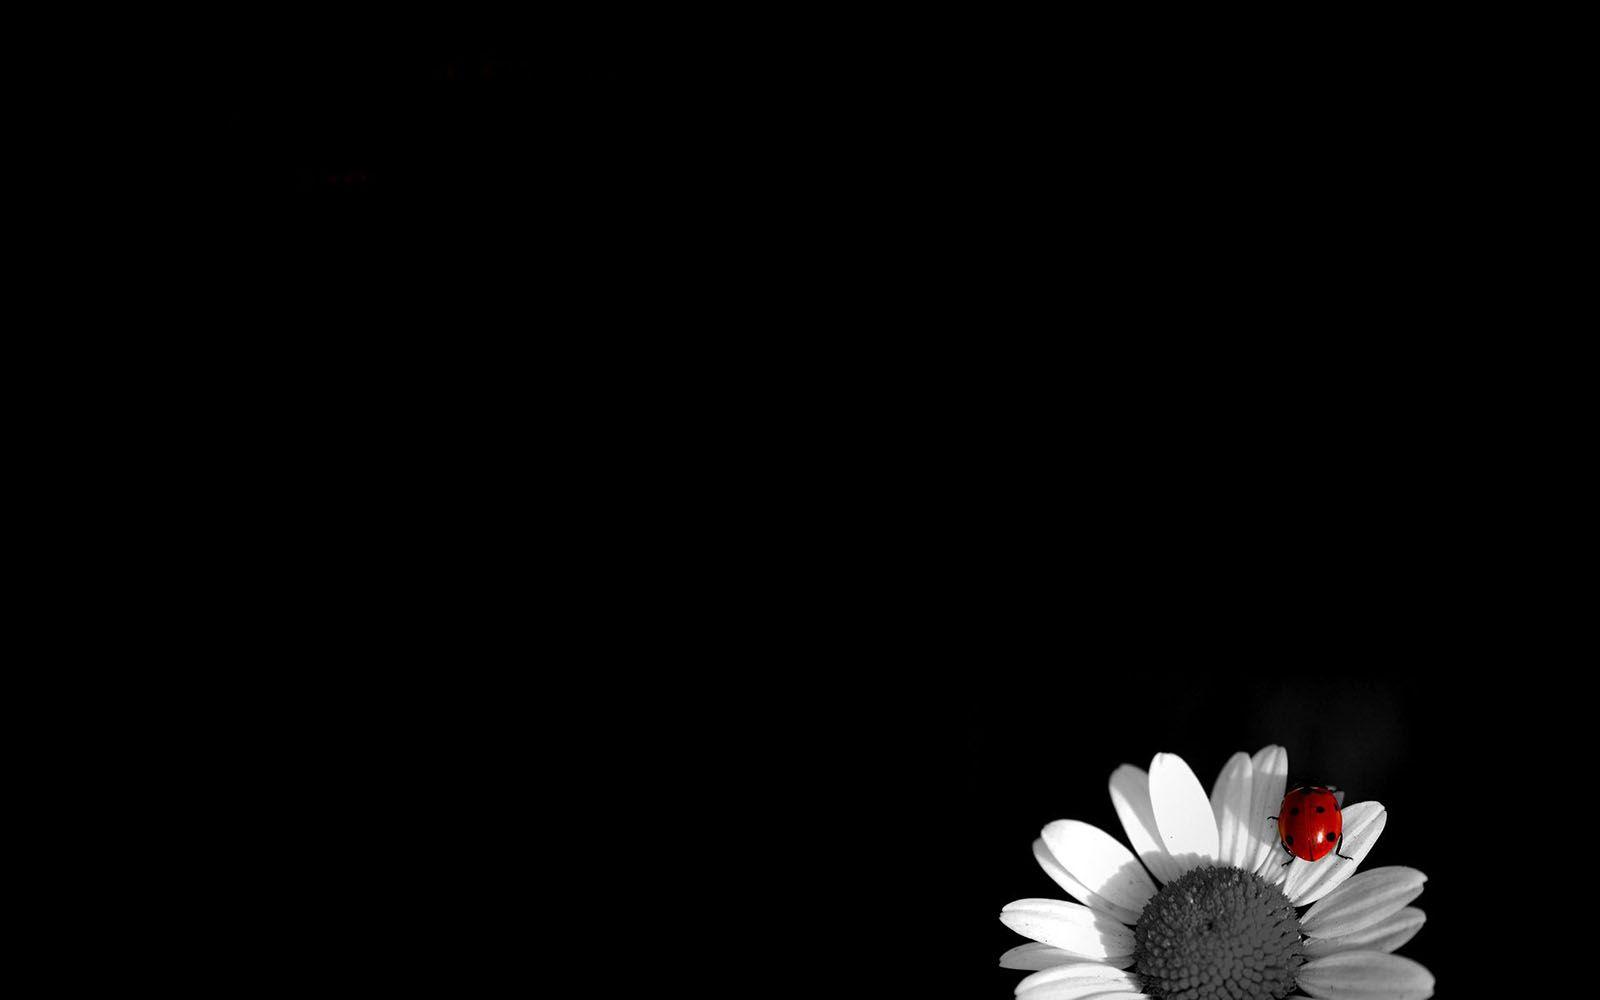 Black Wallpaper Black And White Wallpaper Black And White Background Black Background Wallpaper